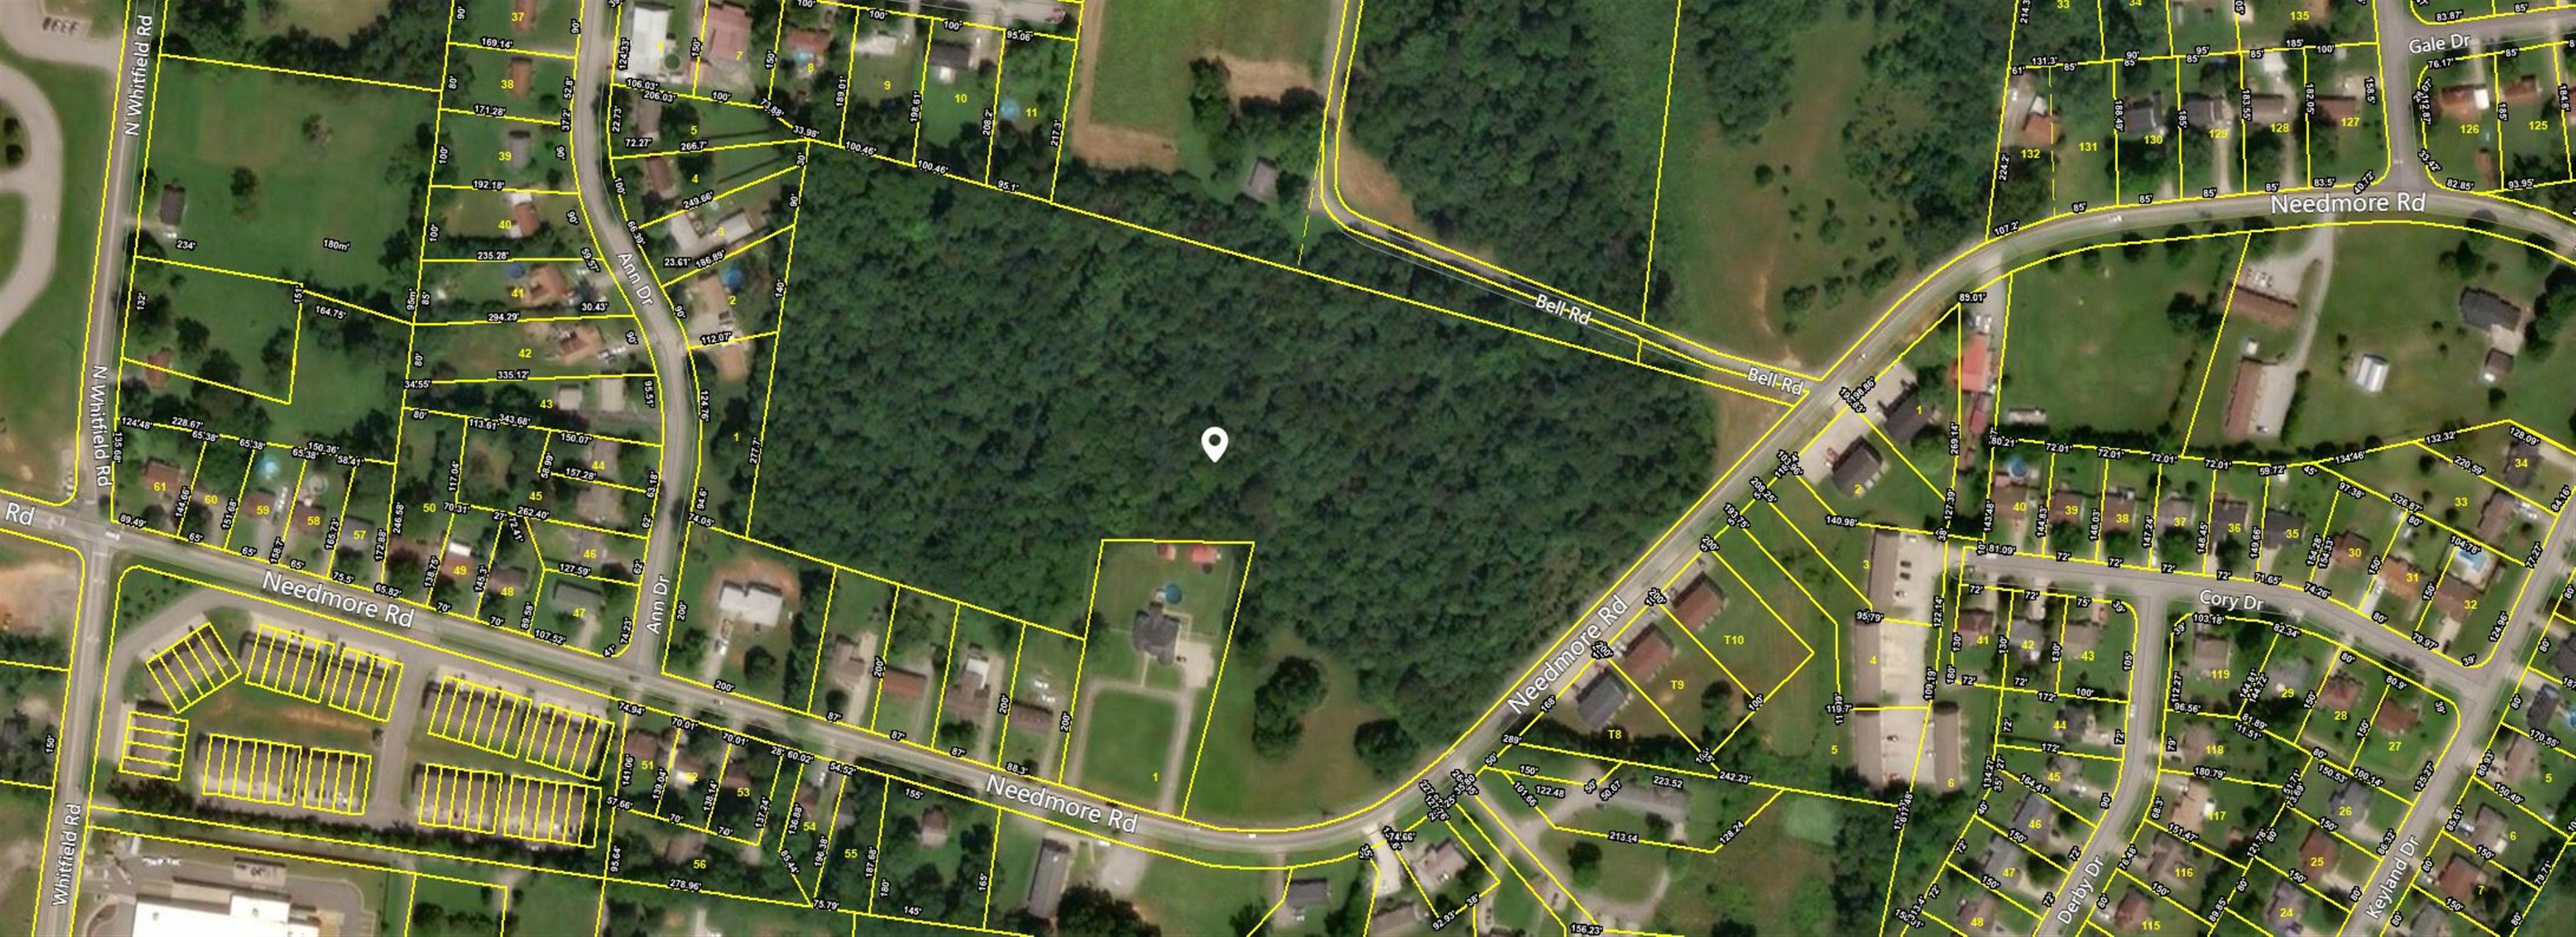 0 Needmore Rd, Clarksville, TN 37040 - Clarksville, TN real estate listing